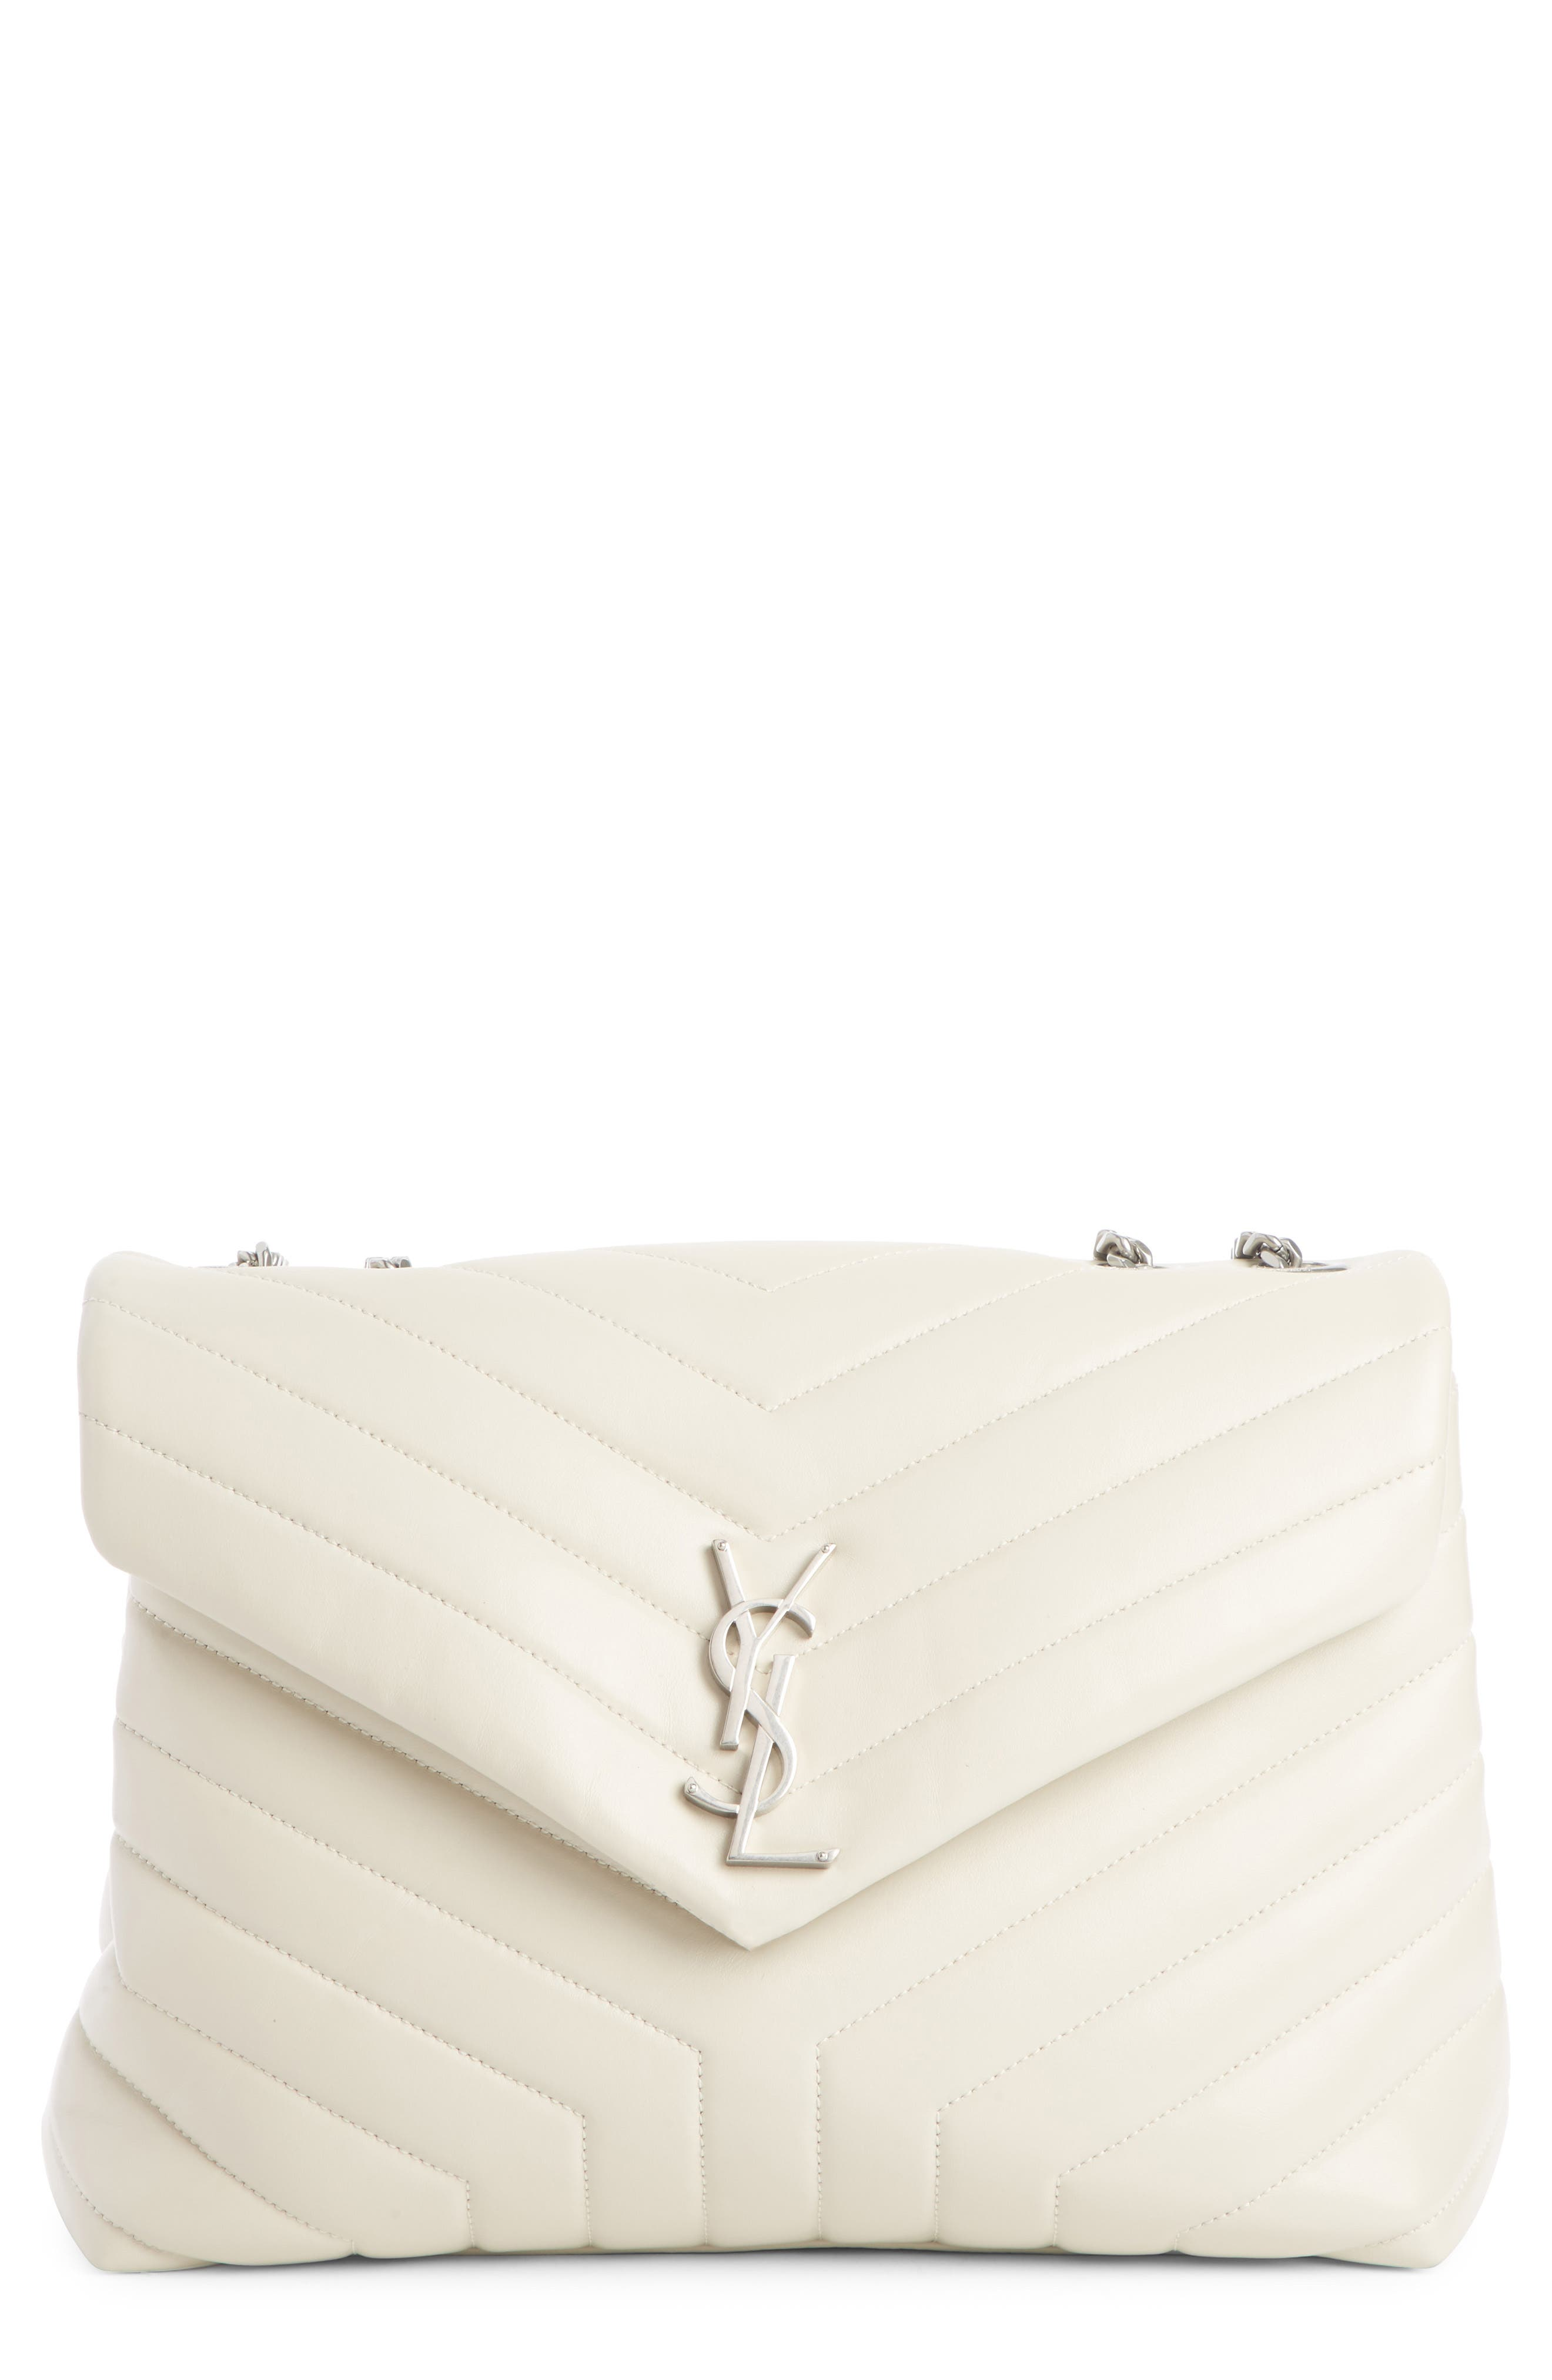 SAINT LAURENT Medium Loulou Calfskin Leather Shoulder Bag, Main, color, CREMA SOFT/ CREMA SOFT